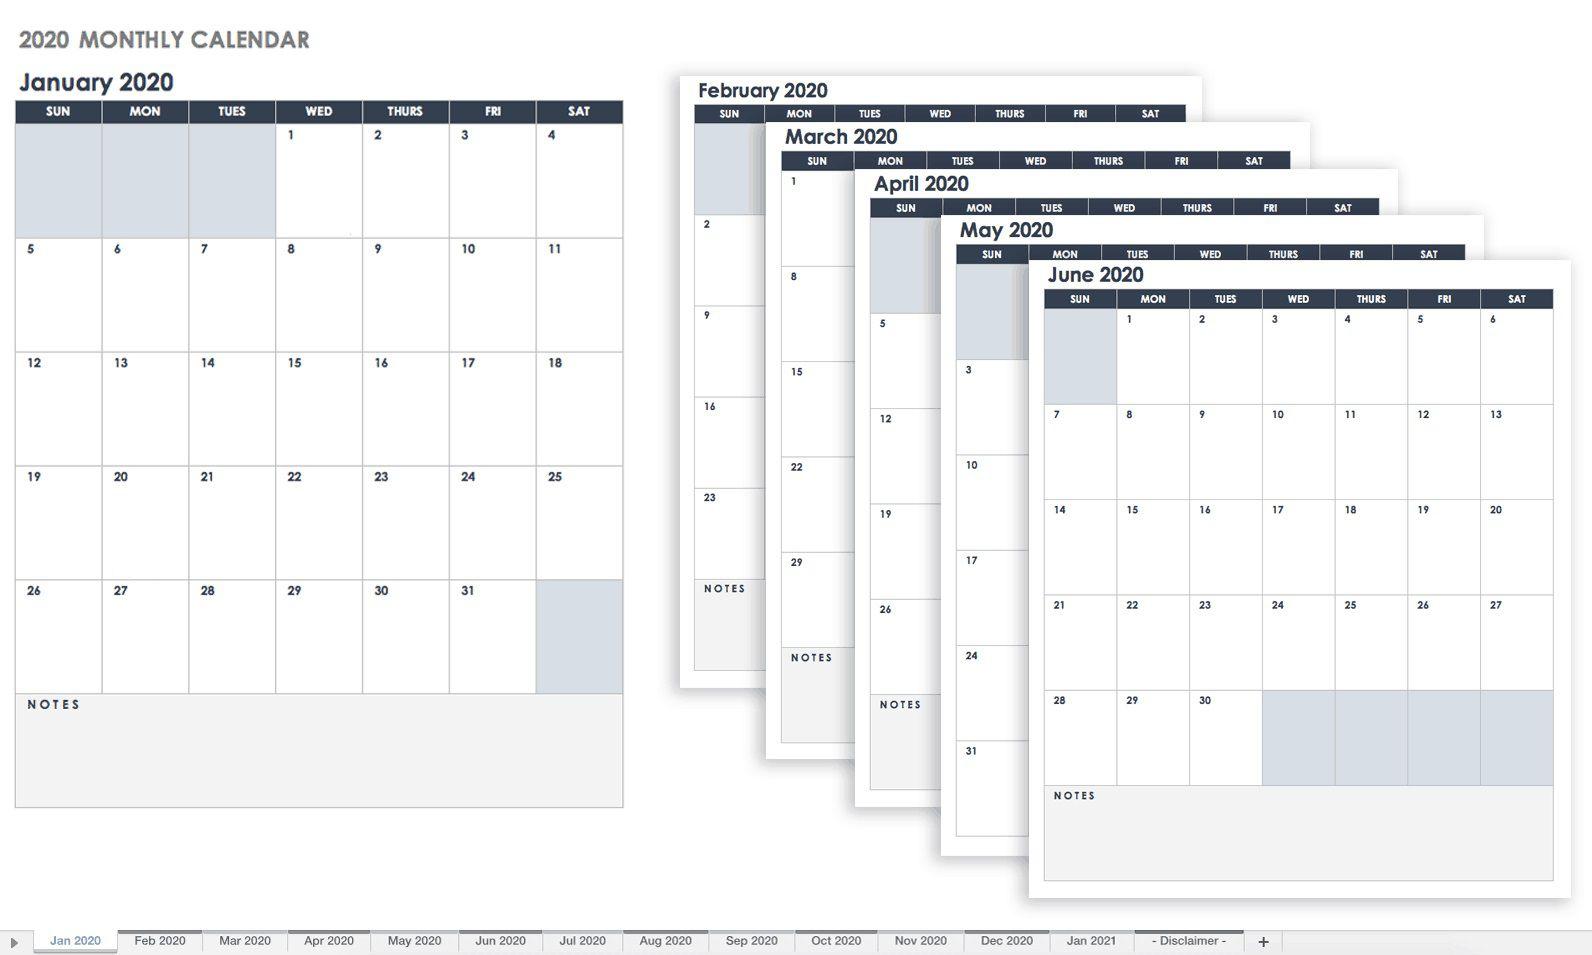 006 Breathtaking Google Sheet Calendar Template High Resolution  Templates Monthly Spreadsheet 2020 2018Full